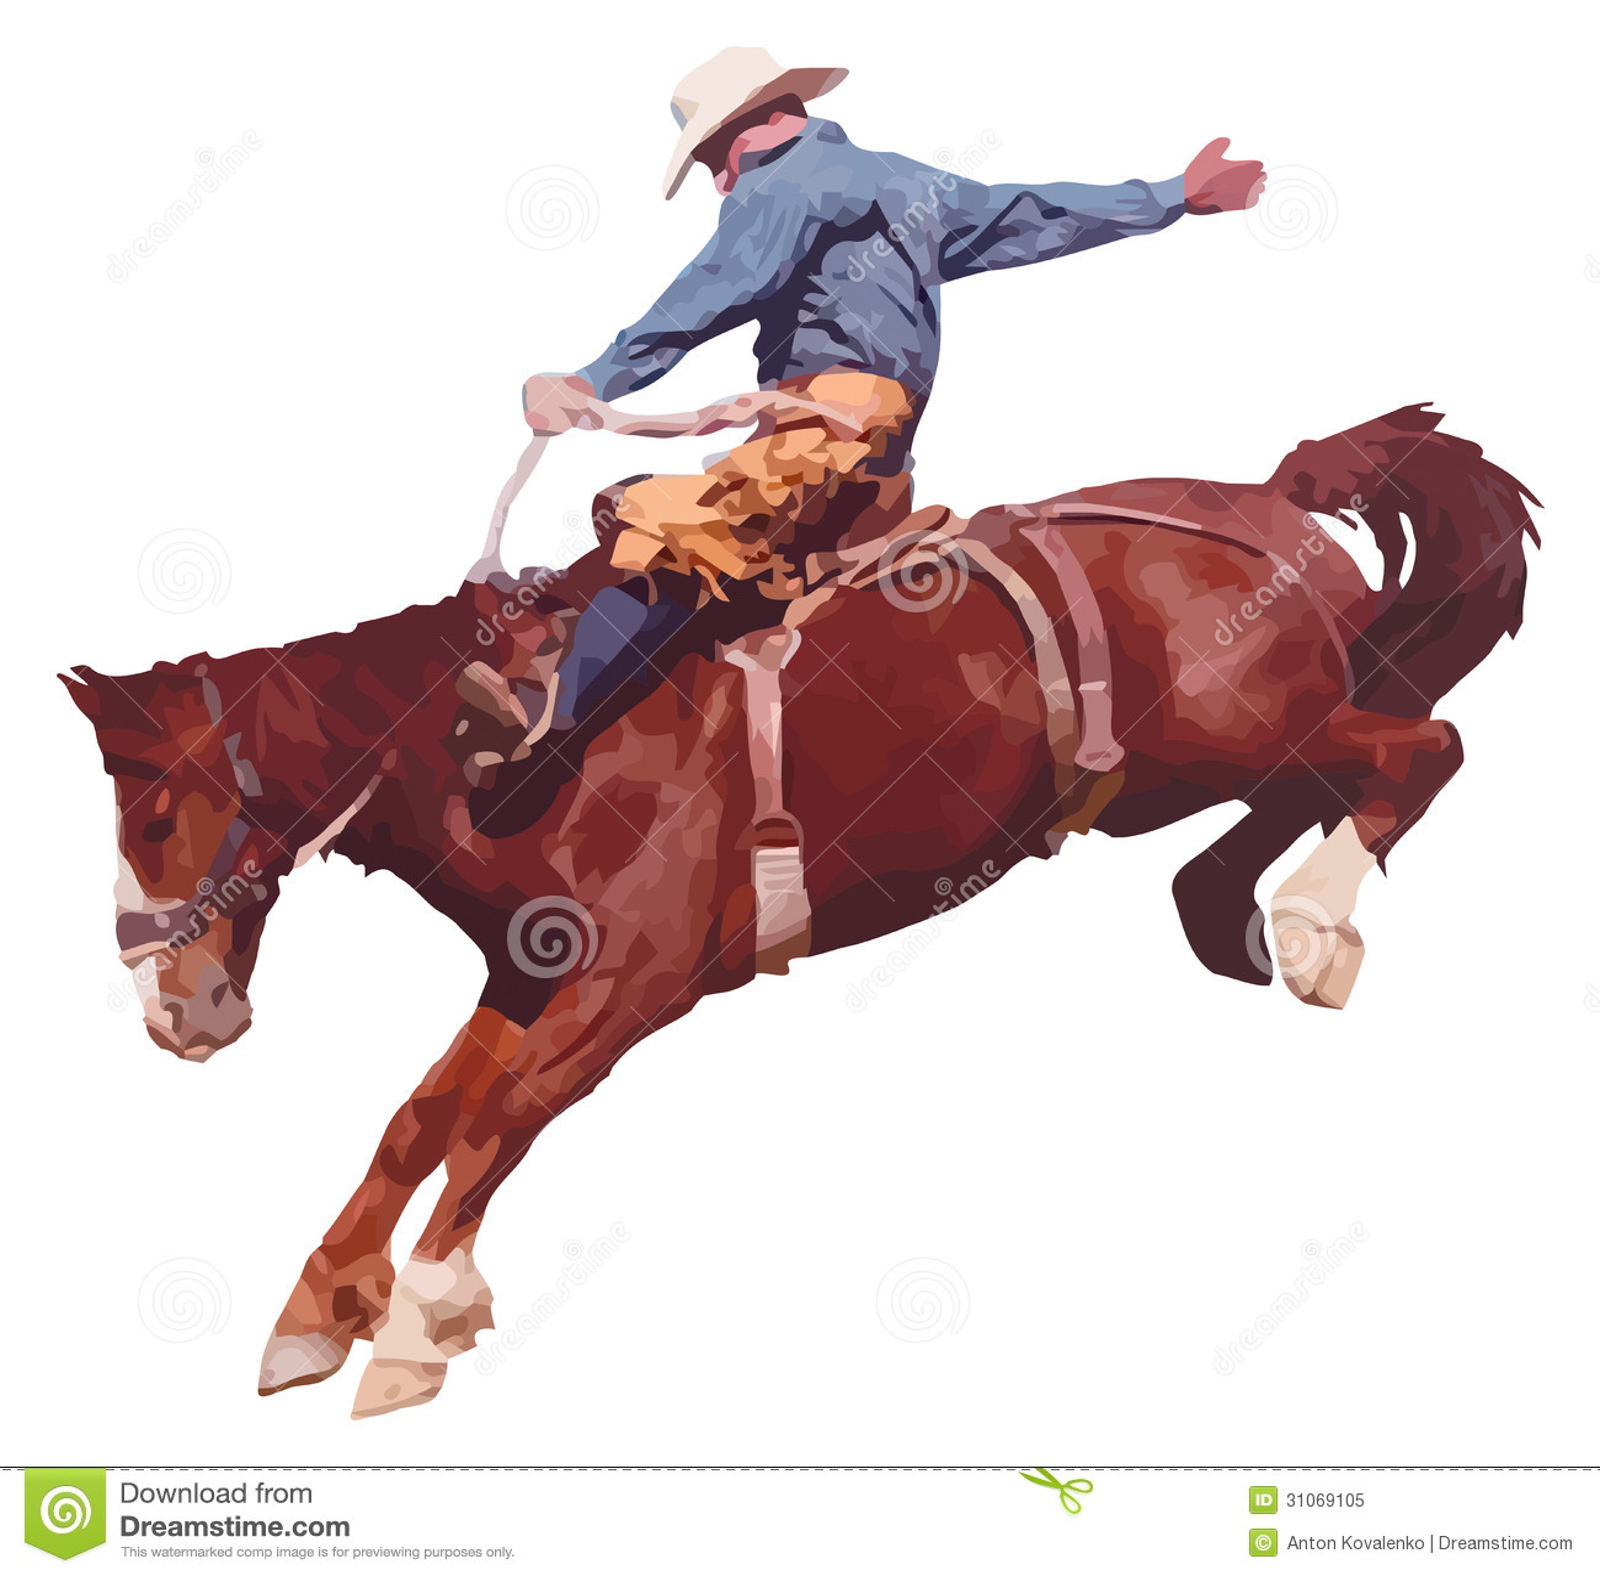 Cowboy Riding Horse At Rodeo. Royalty Free Stock Photo - Image ...